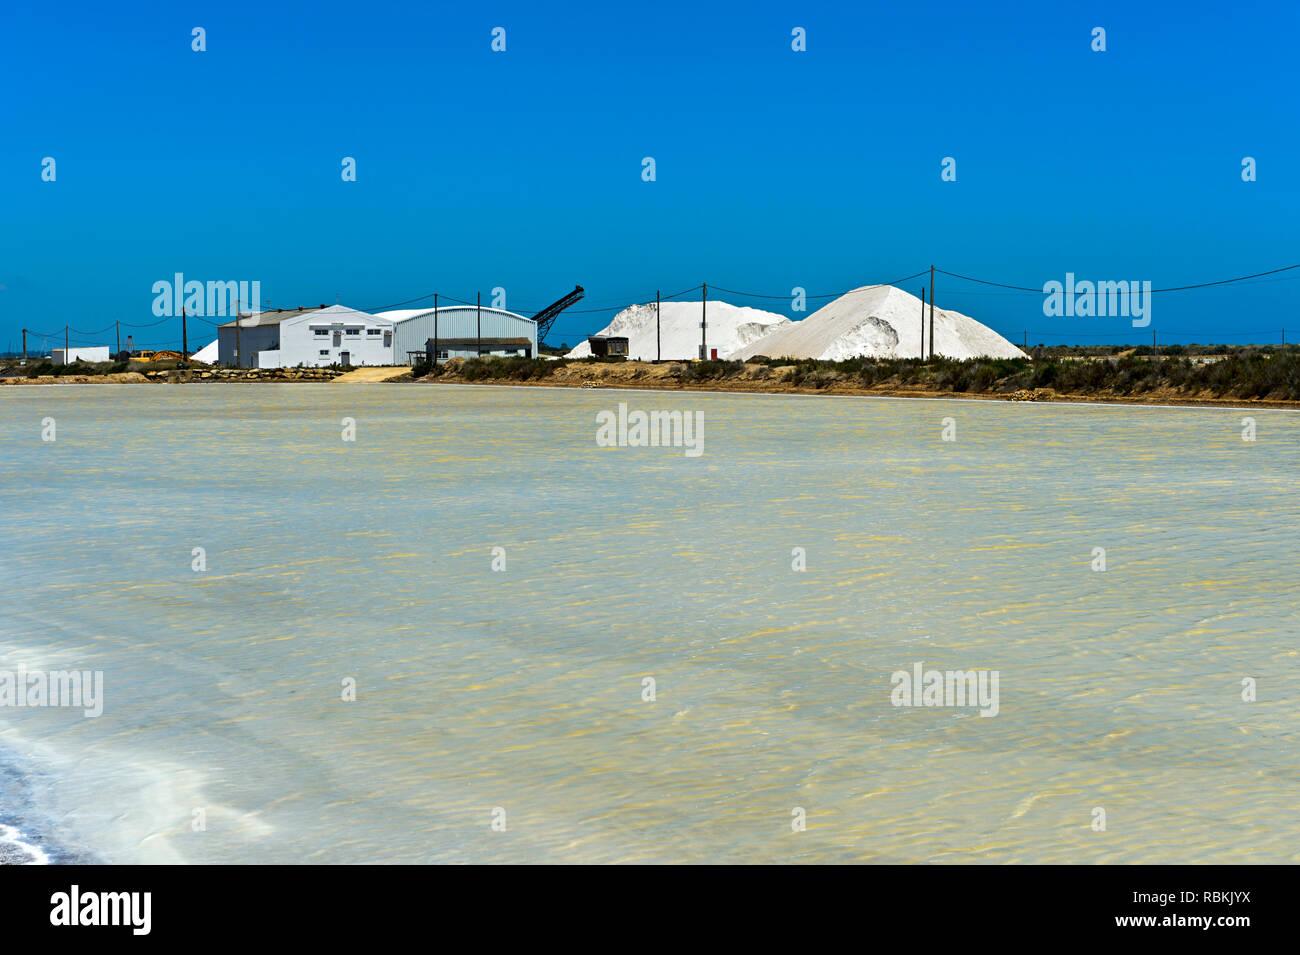 Sea salt production, salt evaporation ponds, Sopursal saline, Santa Luzia, Algarve, Portugal - Stock Image